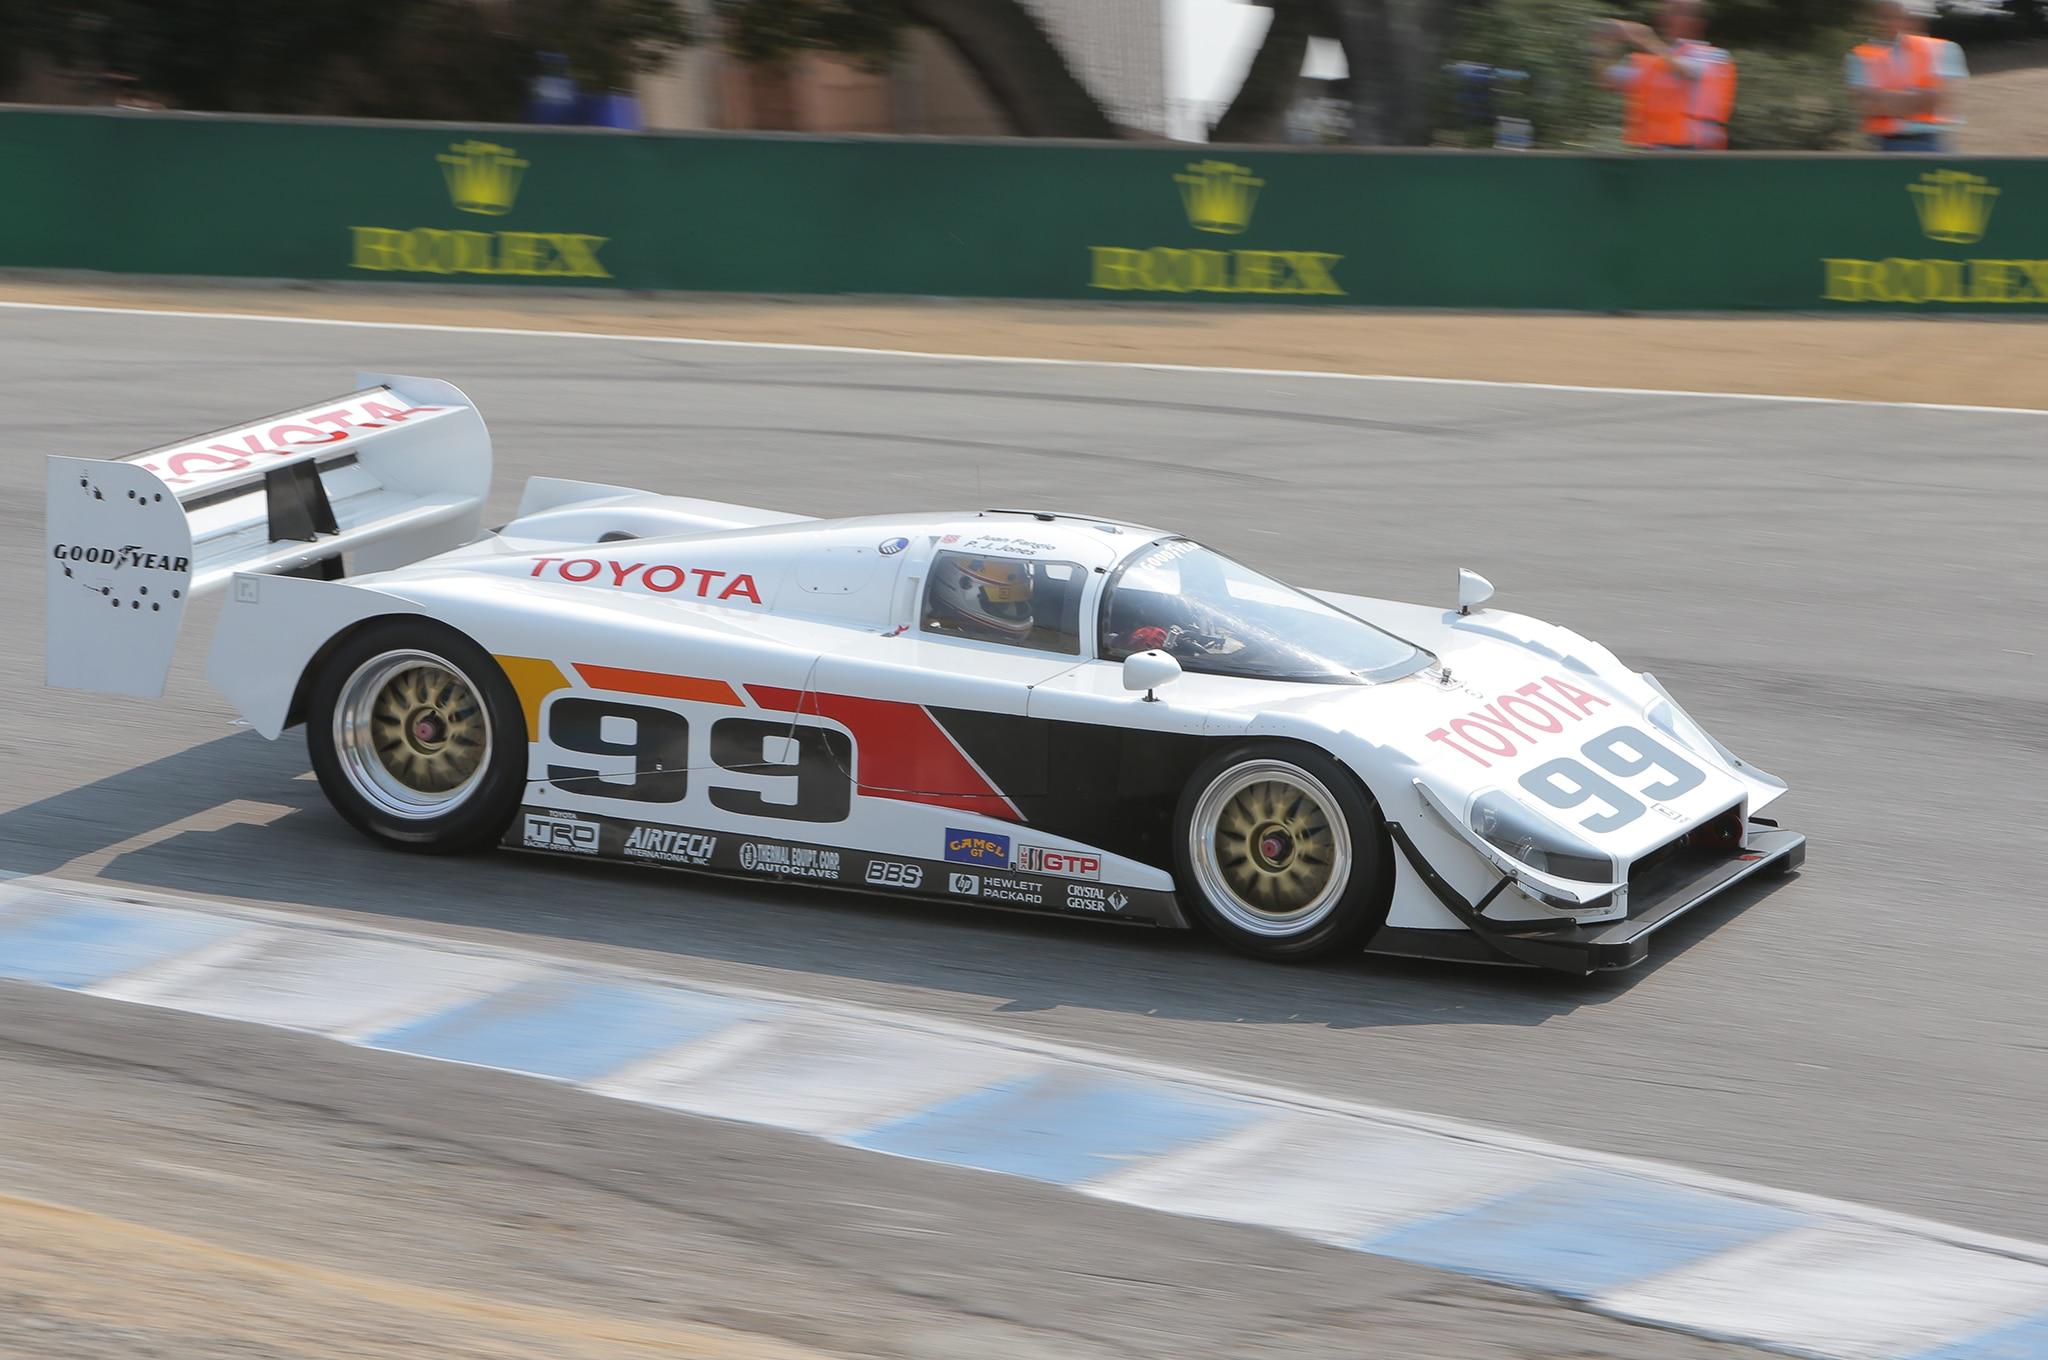 1991 AAR Toyota Eagle MkIII GTP 2016 Monterey Motorsports Reunion